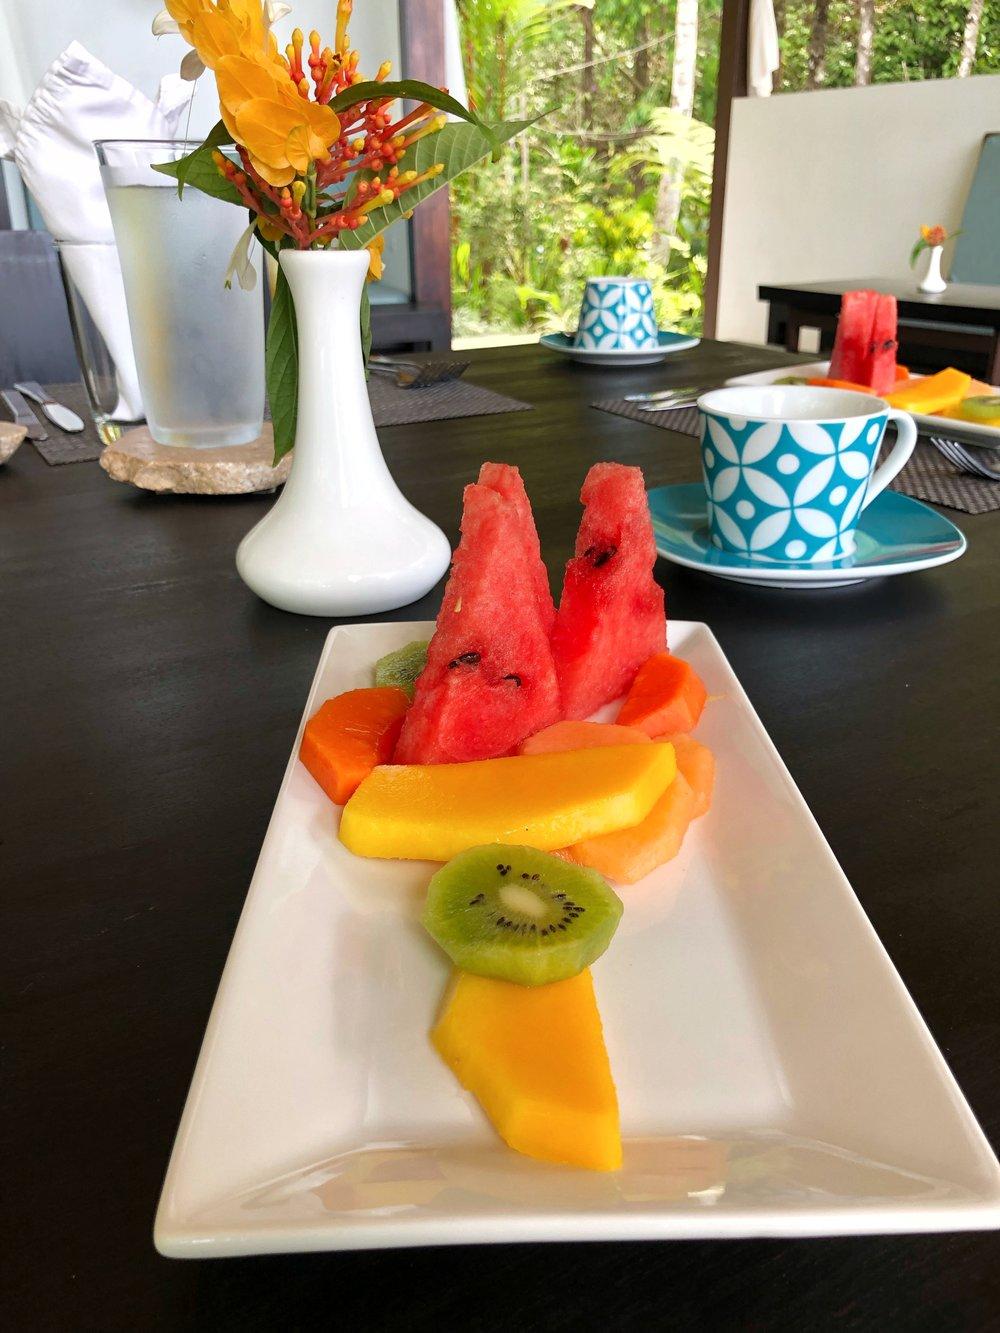 Vegan Food Costa Rica: Vista Celestial